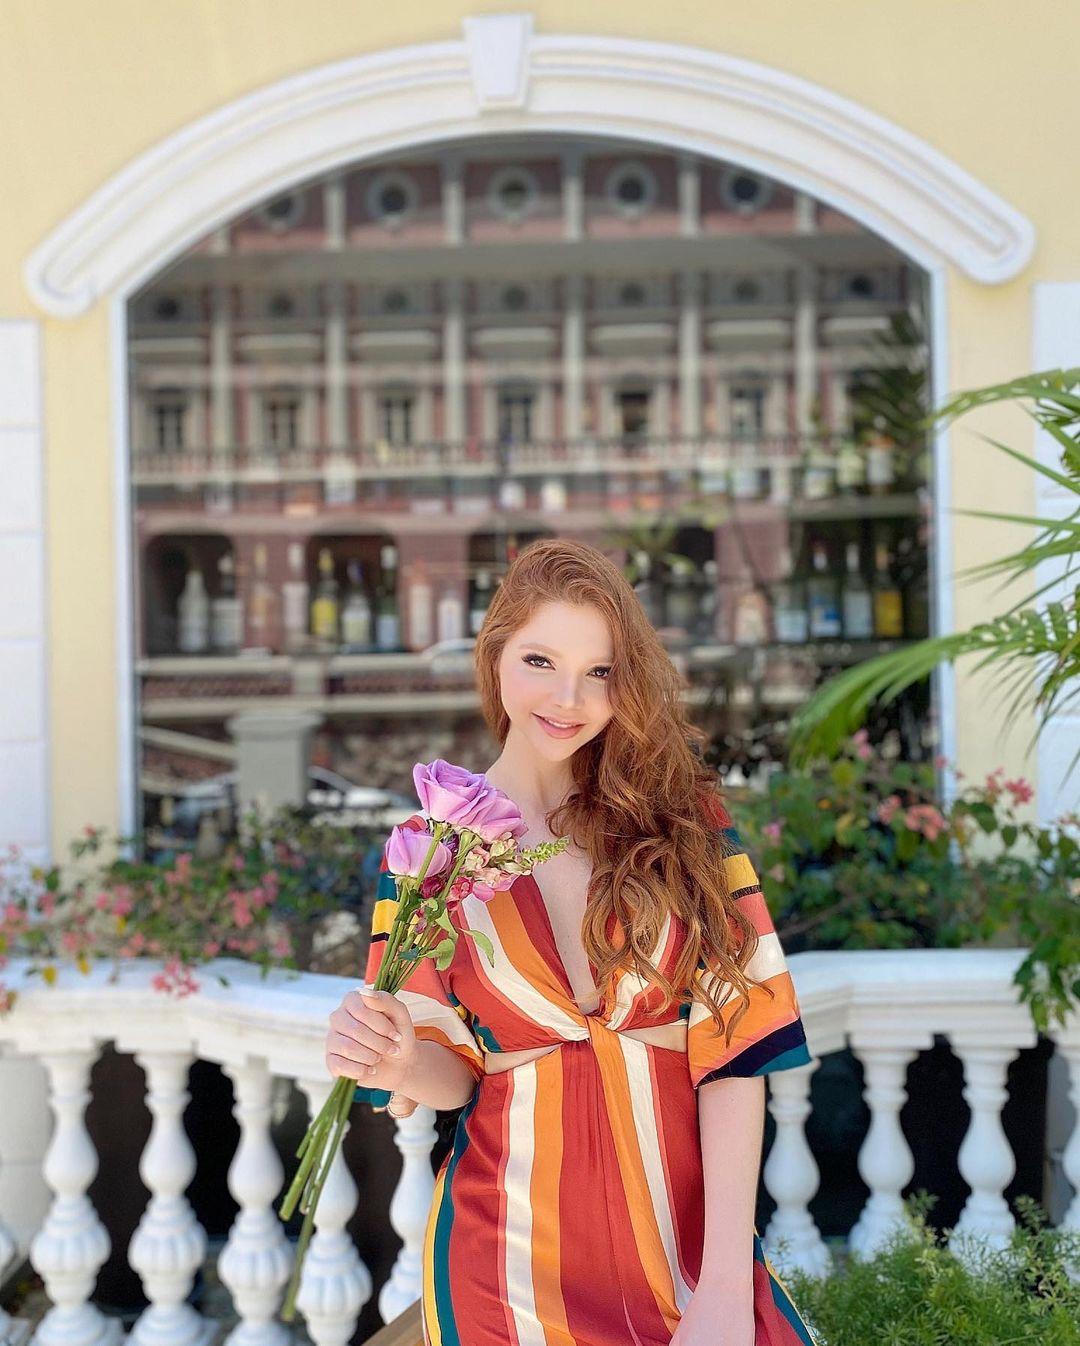 nathaly felix, top 20 de miss brasil mundo 2019. - Página 4 13081138